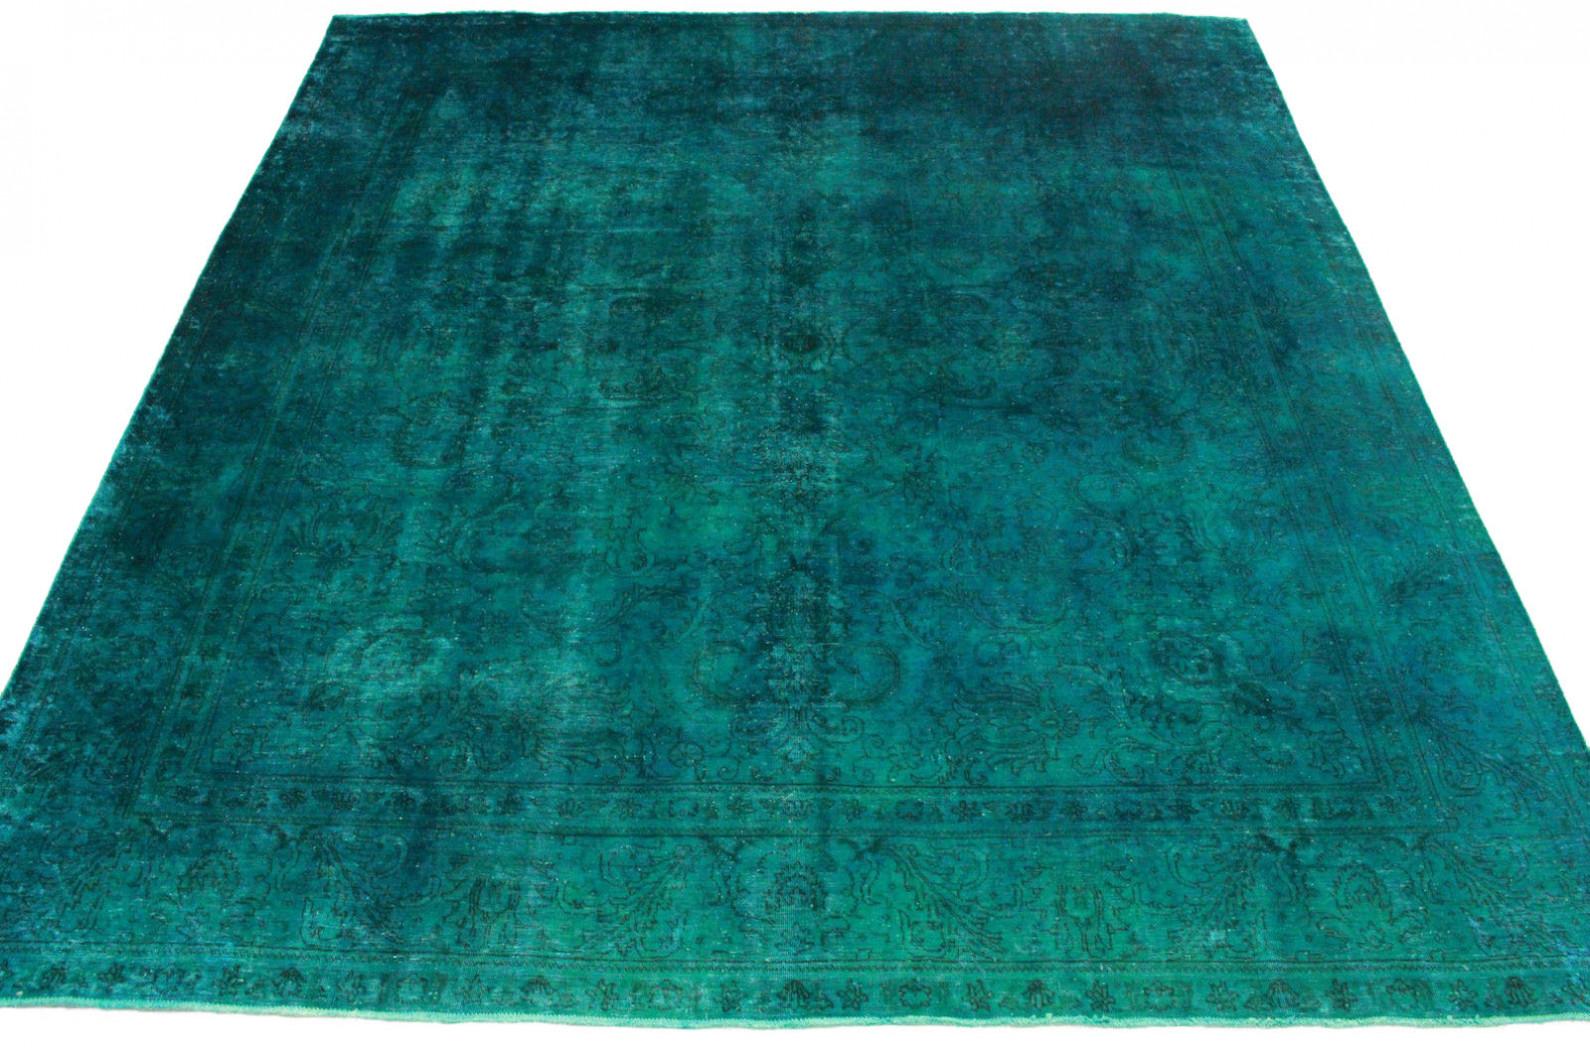 vintage teppich gr n t rkis in 380x330cm 1001 3260 bei kaufen. Black Bedroom Furniture Sets. Home Design Ideas